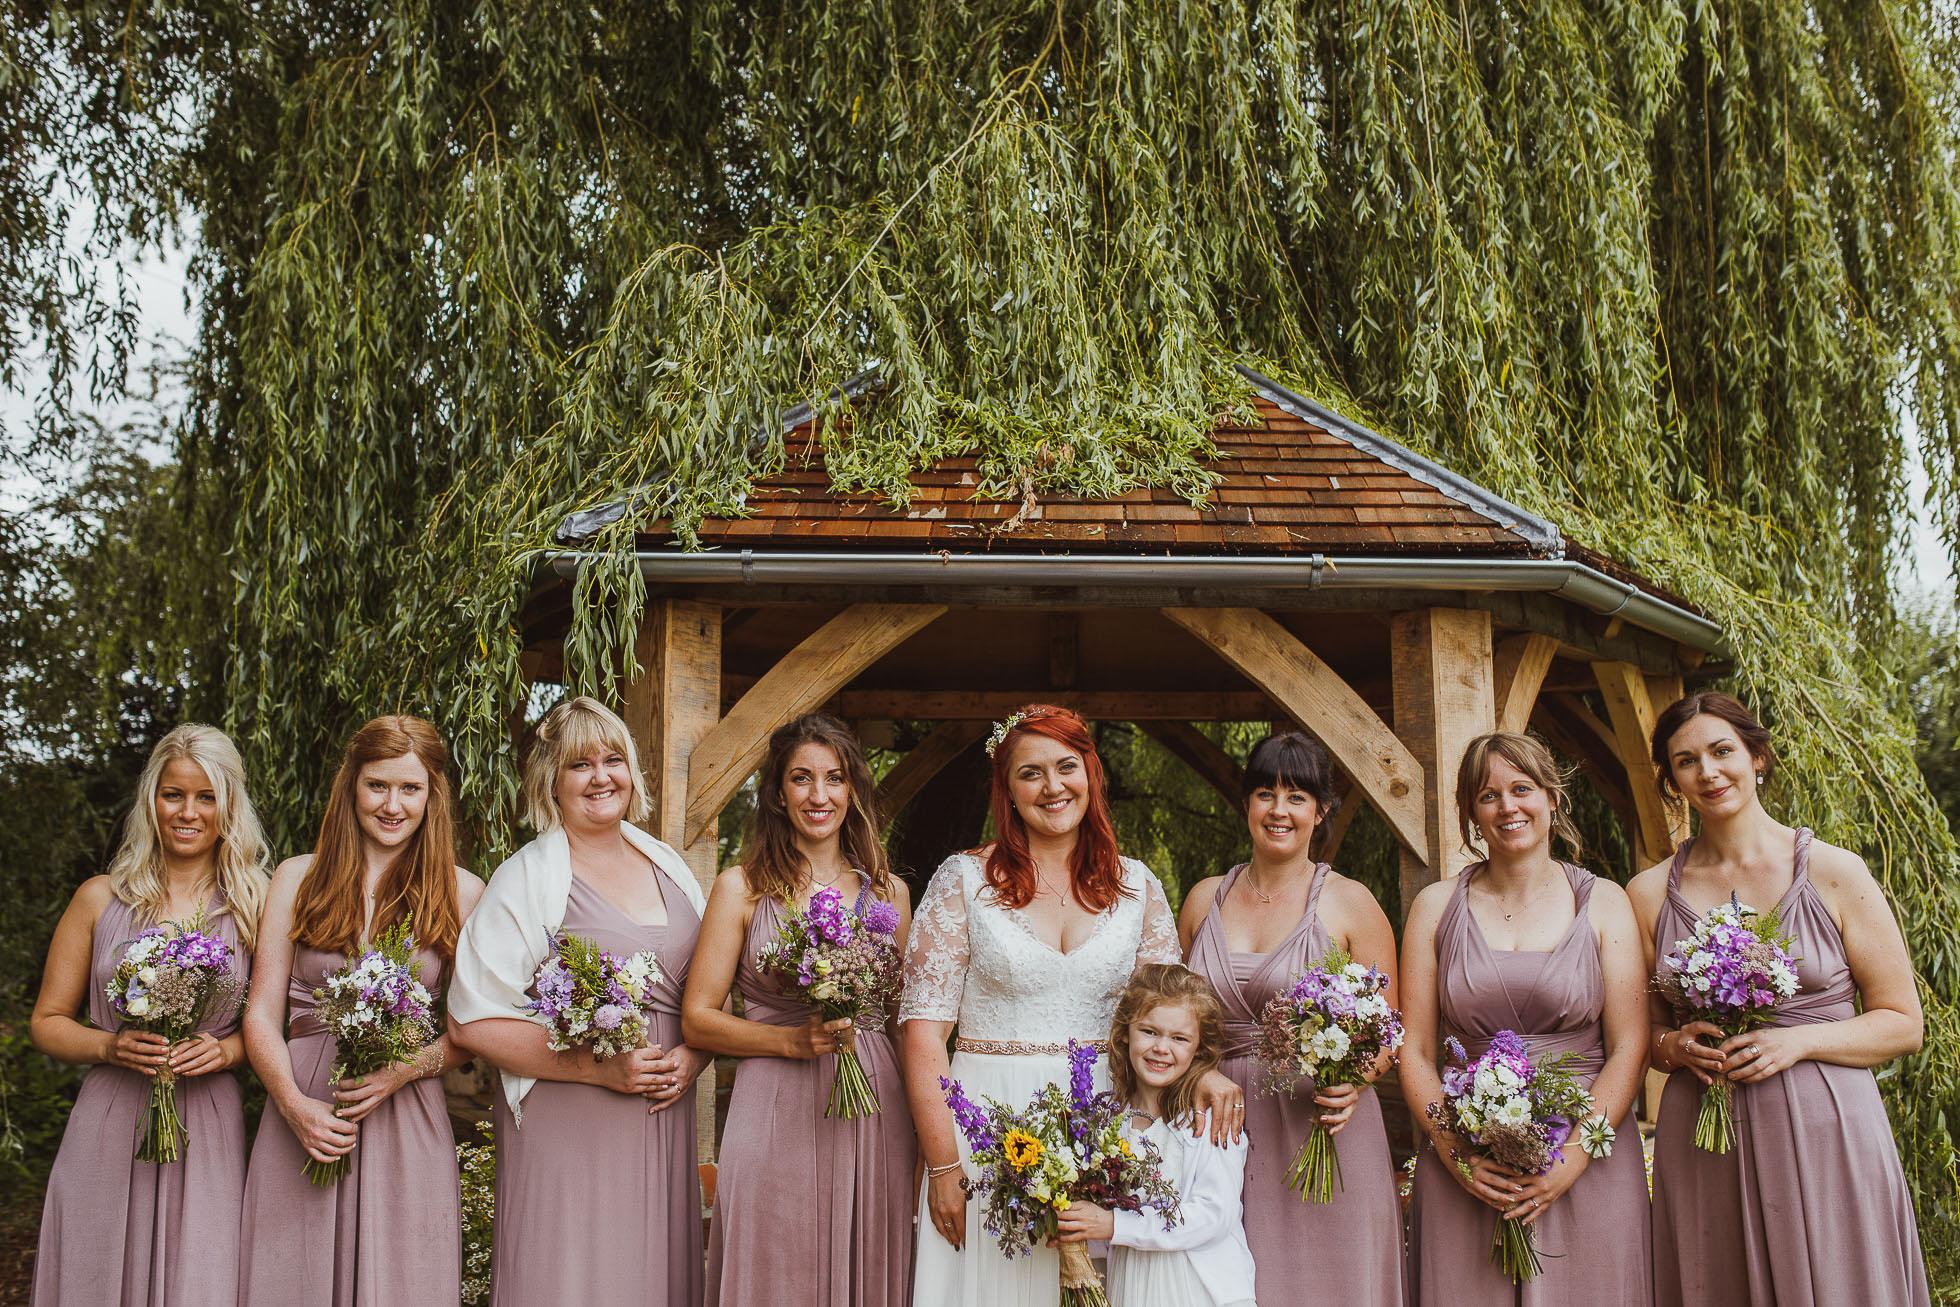 skipbridge_farm_wedding_york-65.jpg